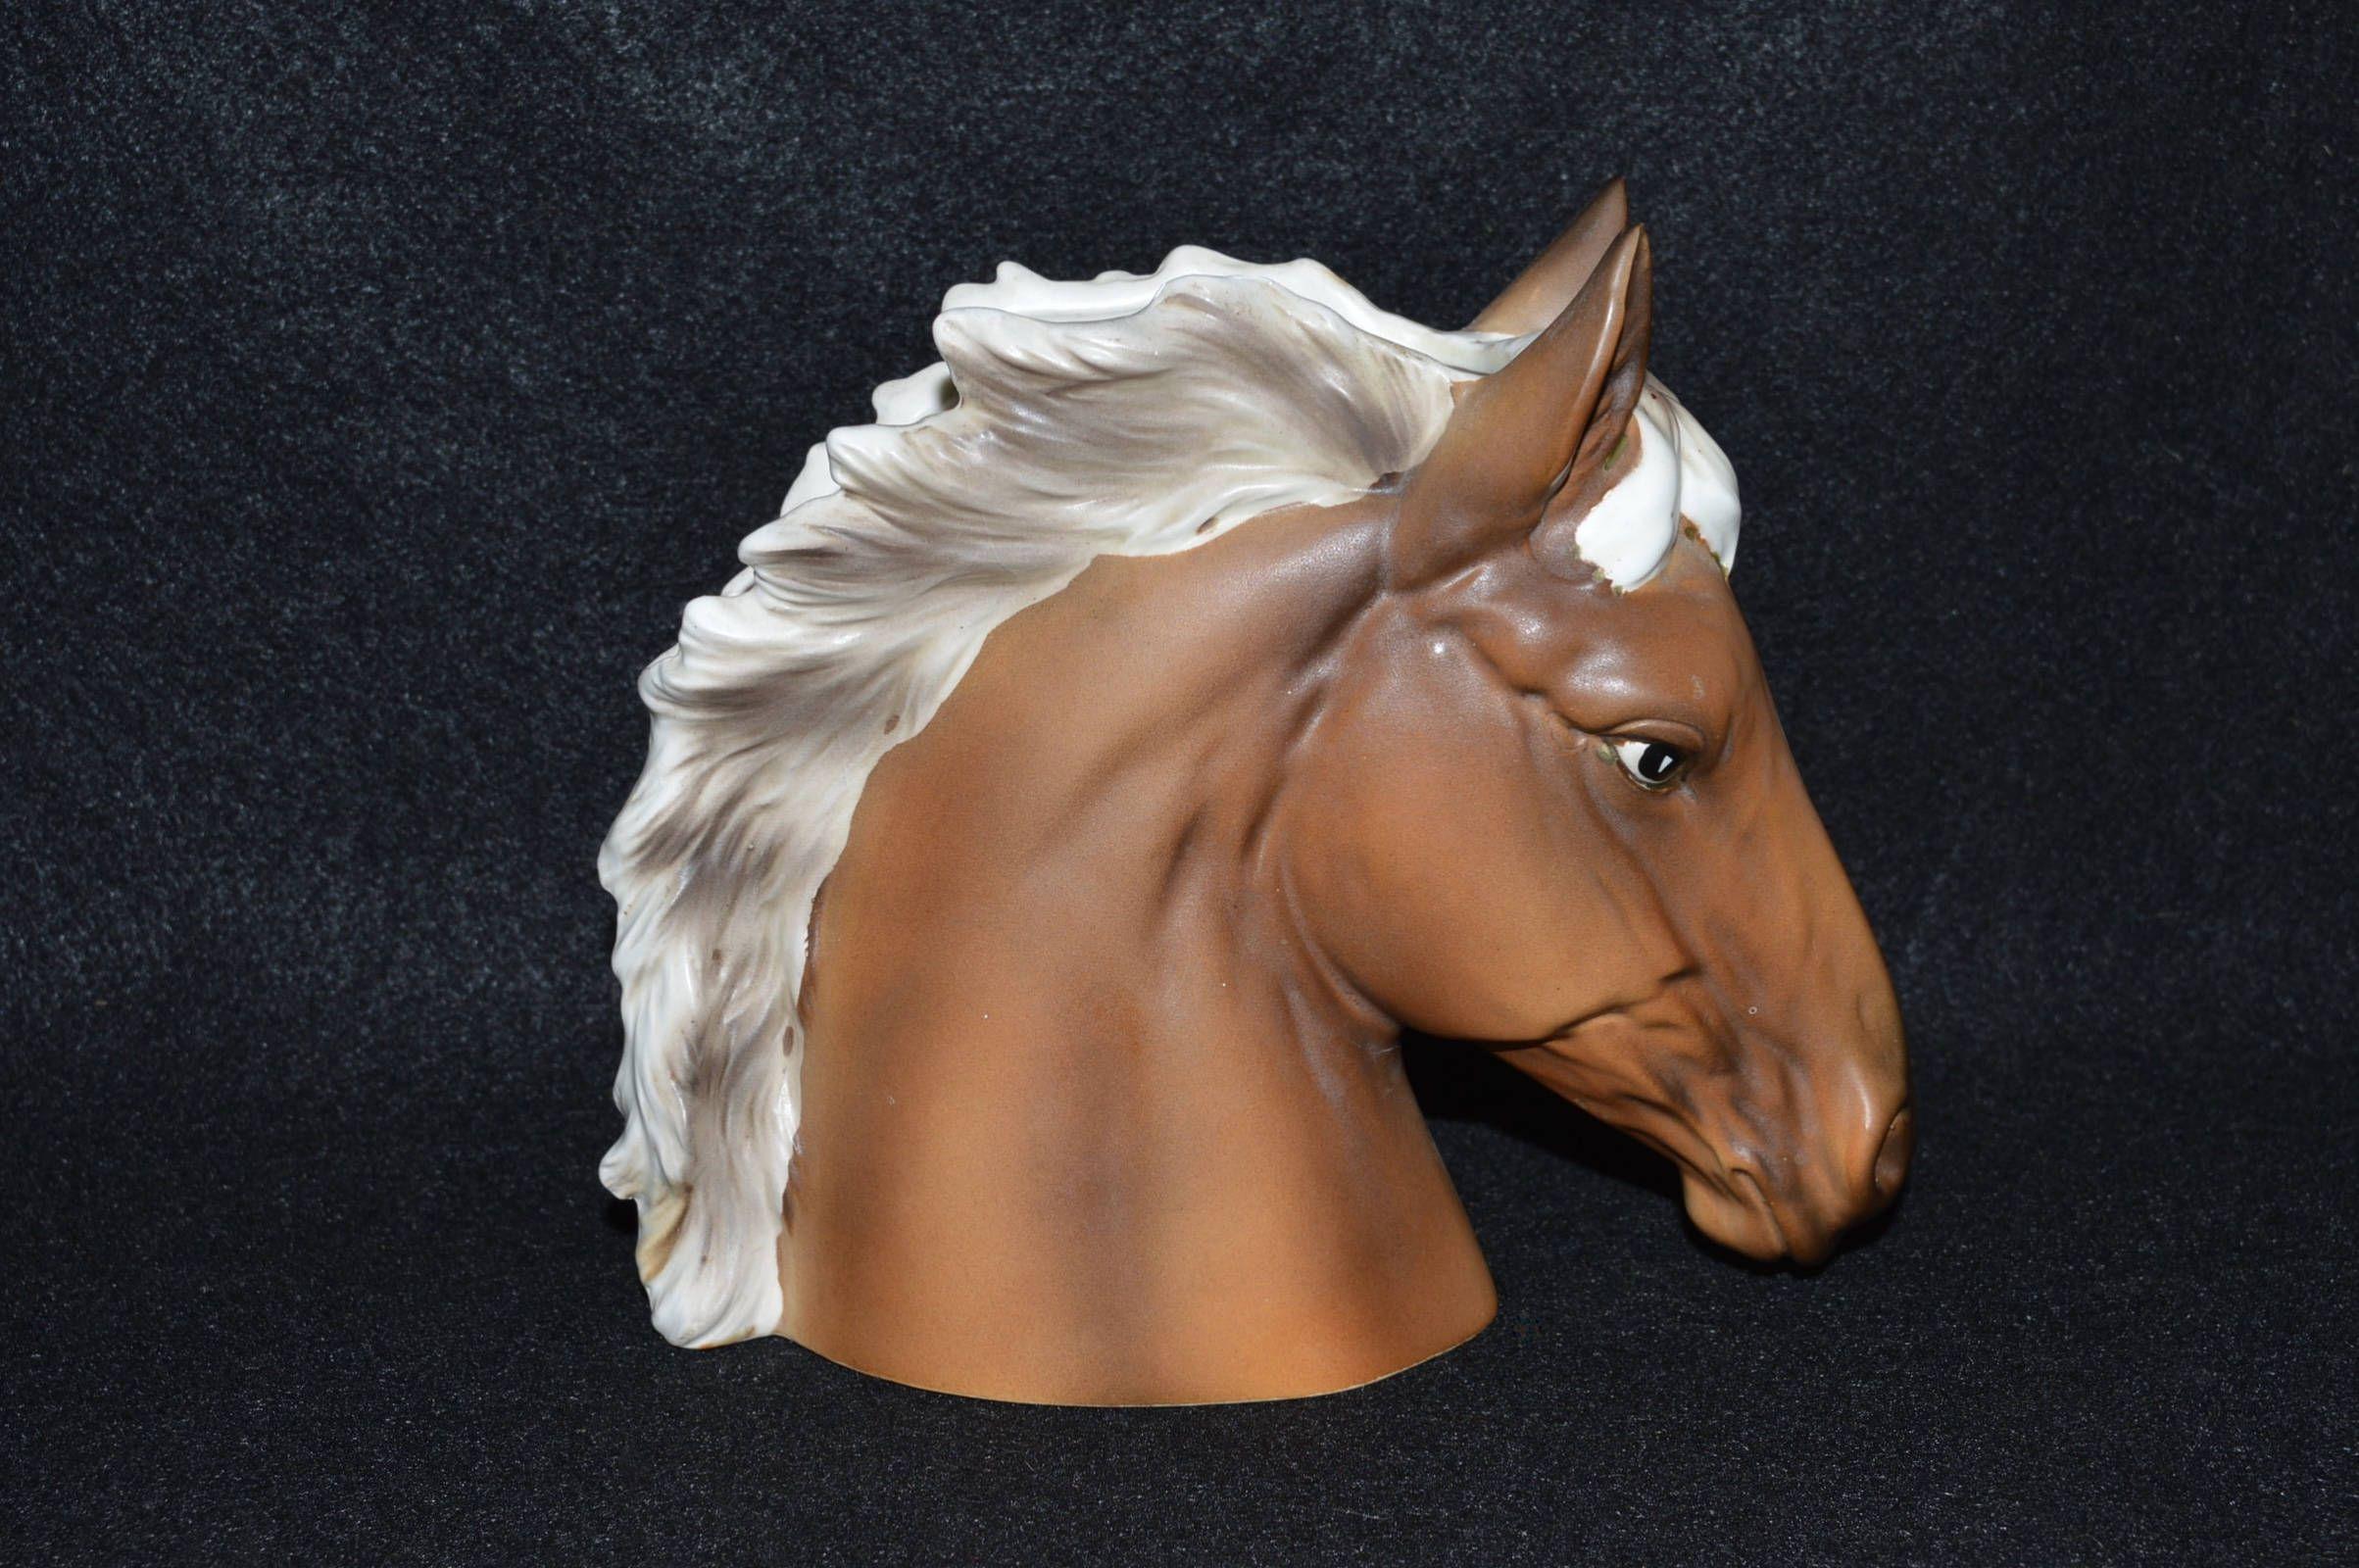 Horse Head Planter, Palomino Horse, Figural Horse Planter, Inarco Planter, Horse Head Pot, Palomino Horse Gift, Animal Planters, Horse Decor by FabulousVintageStore on Etsy